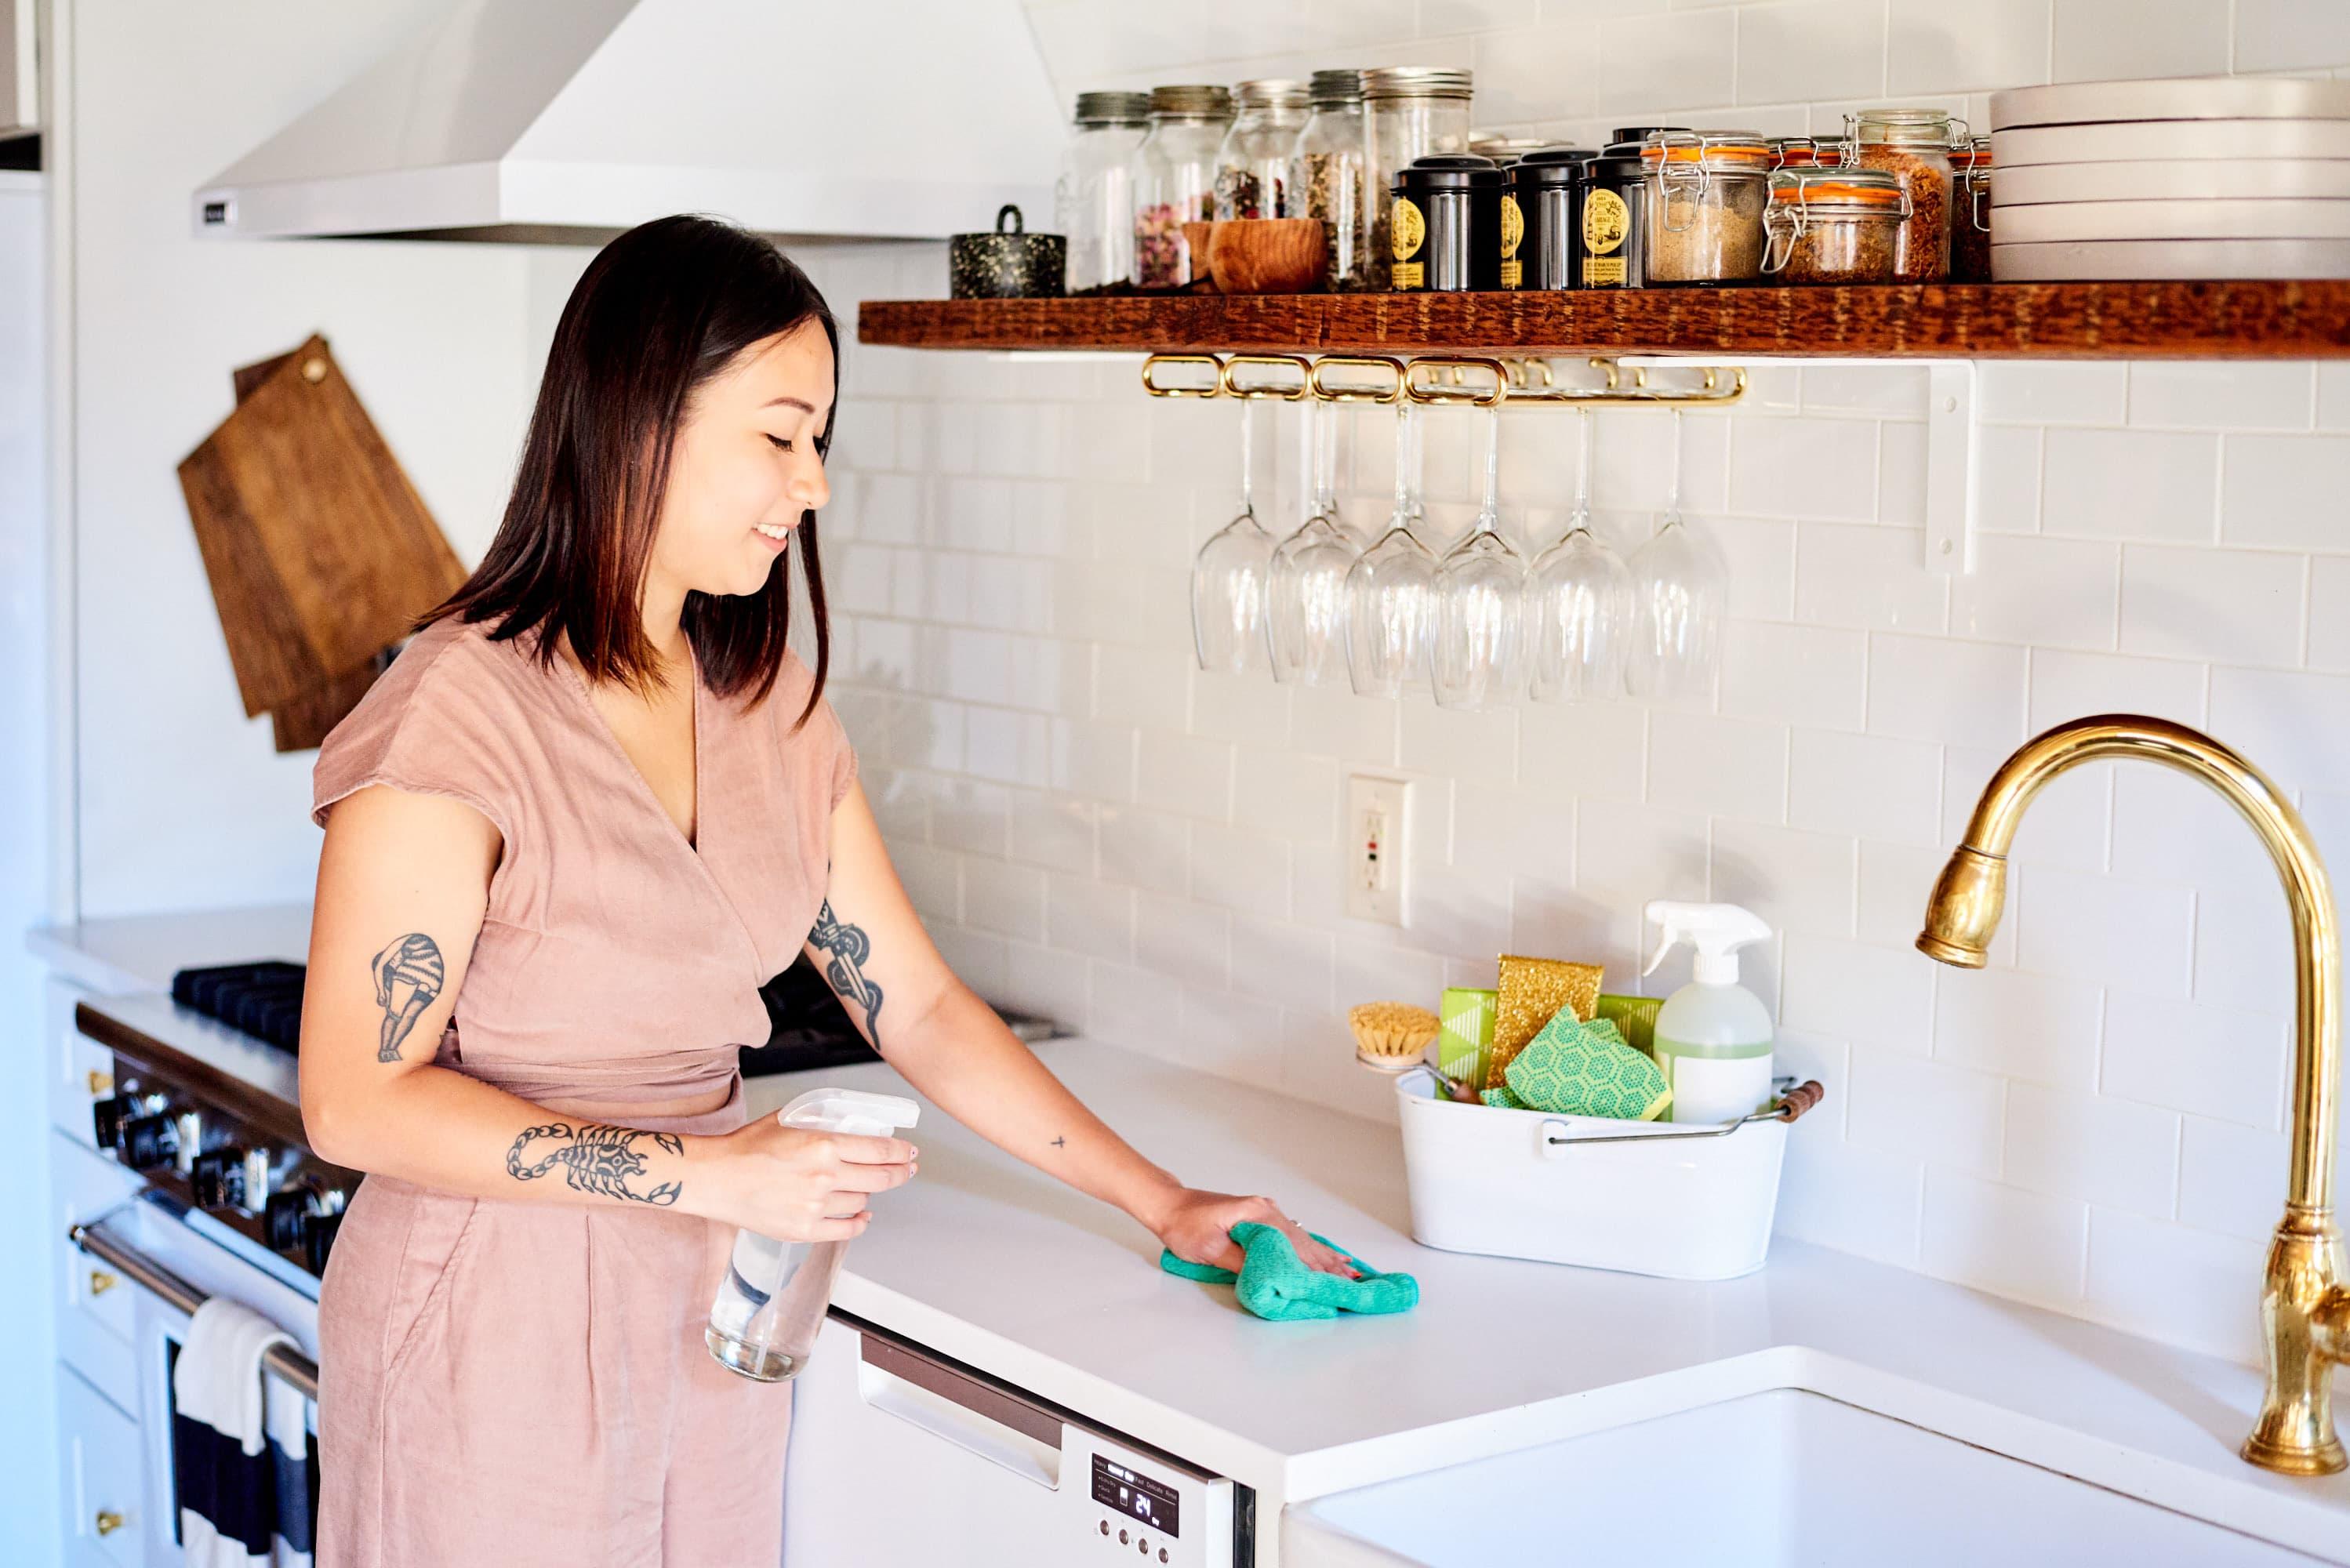 Cleaning kitchen,nari